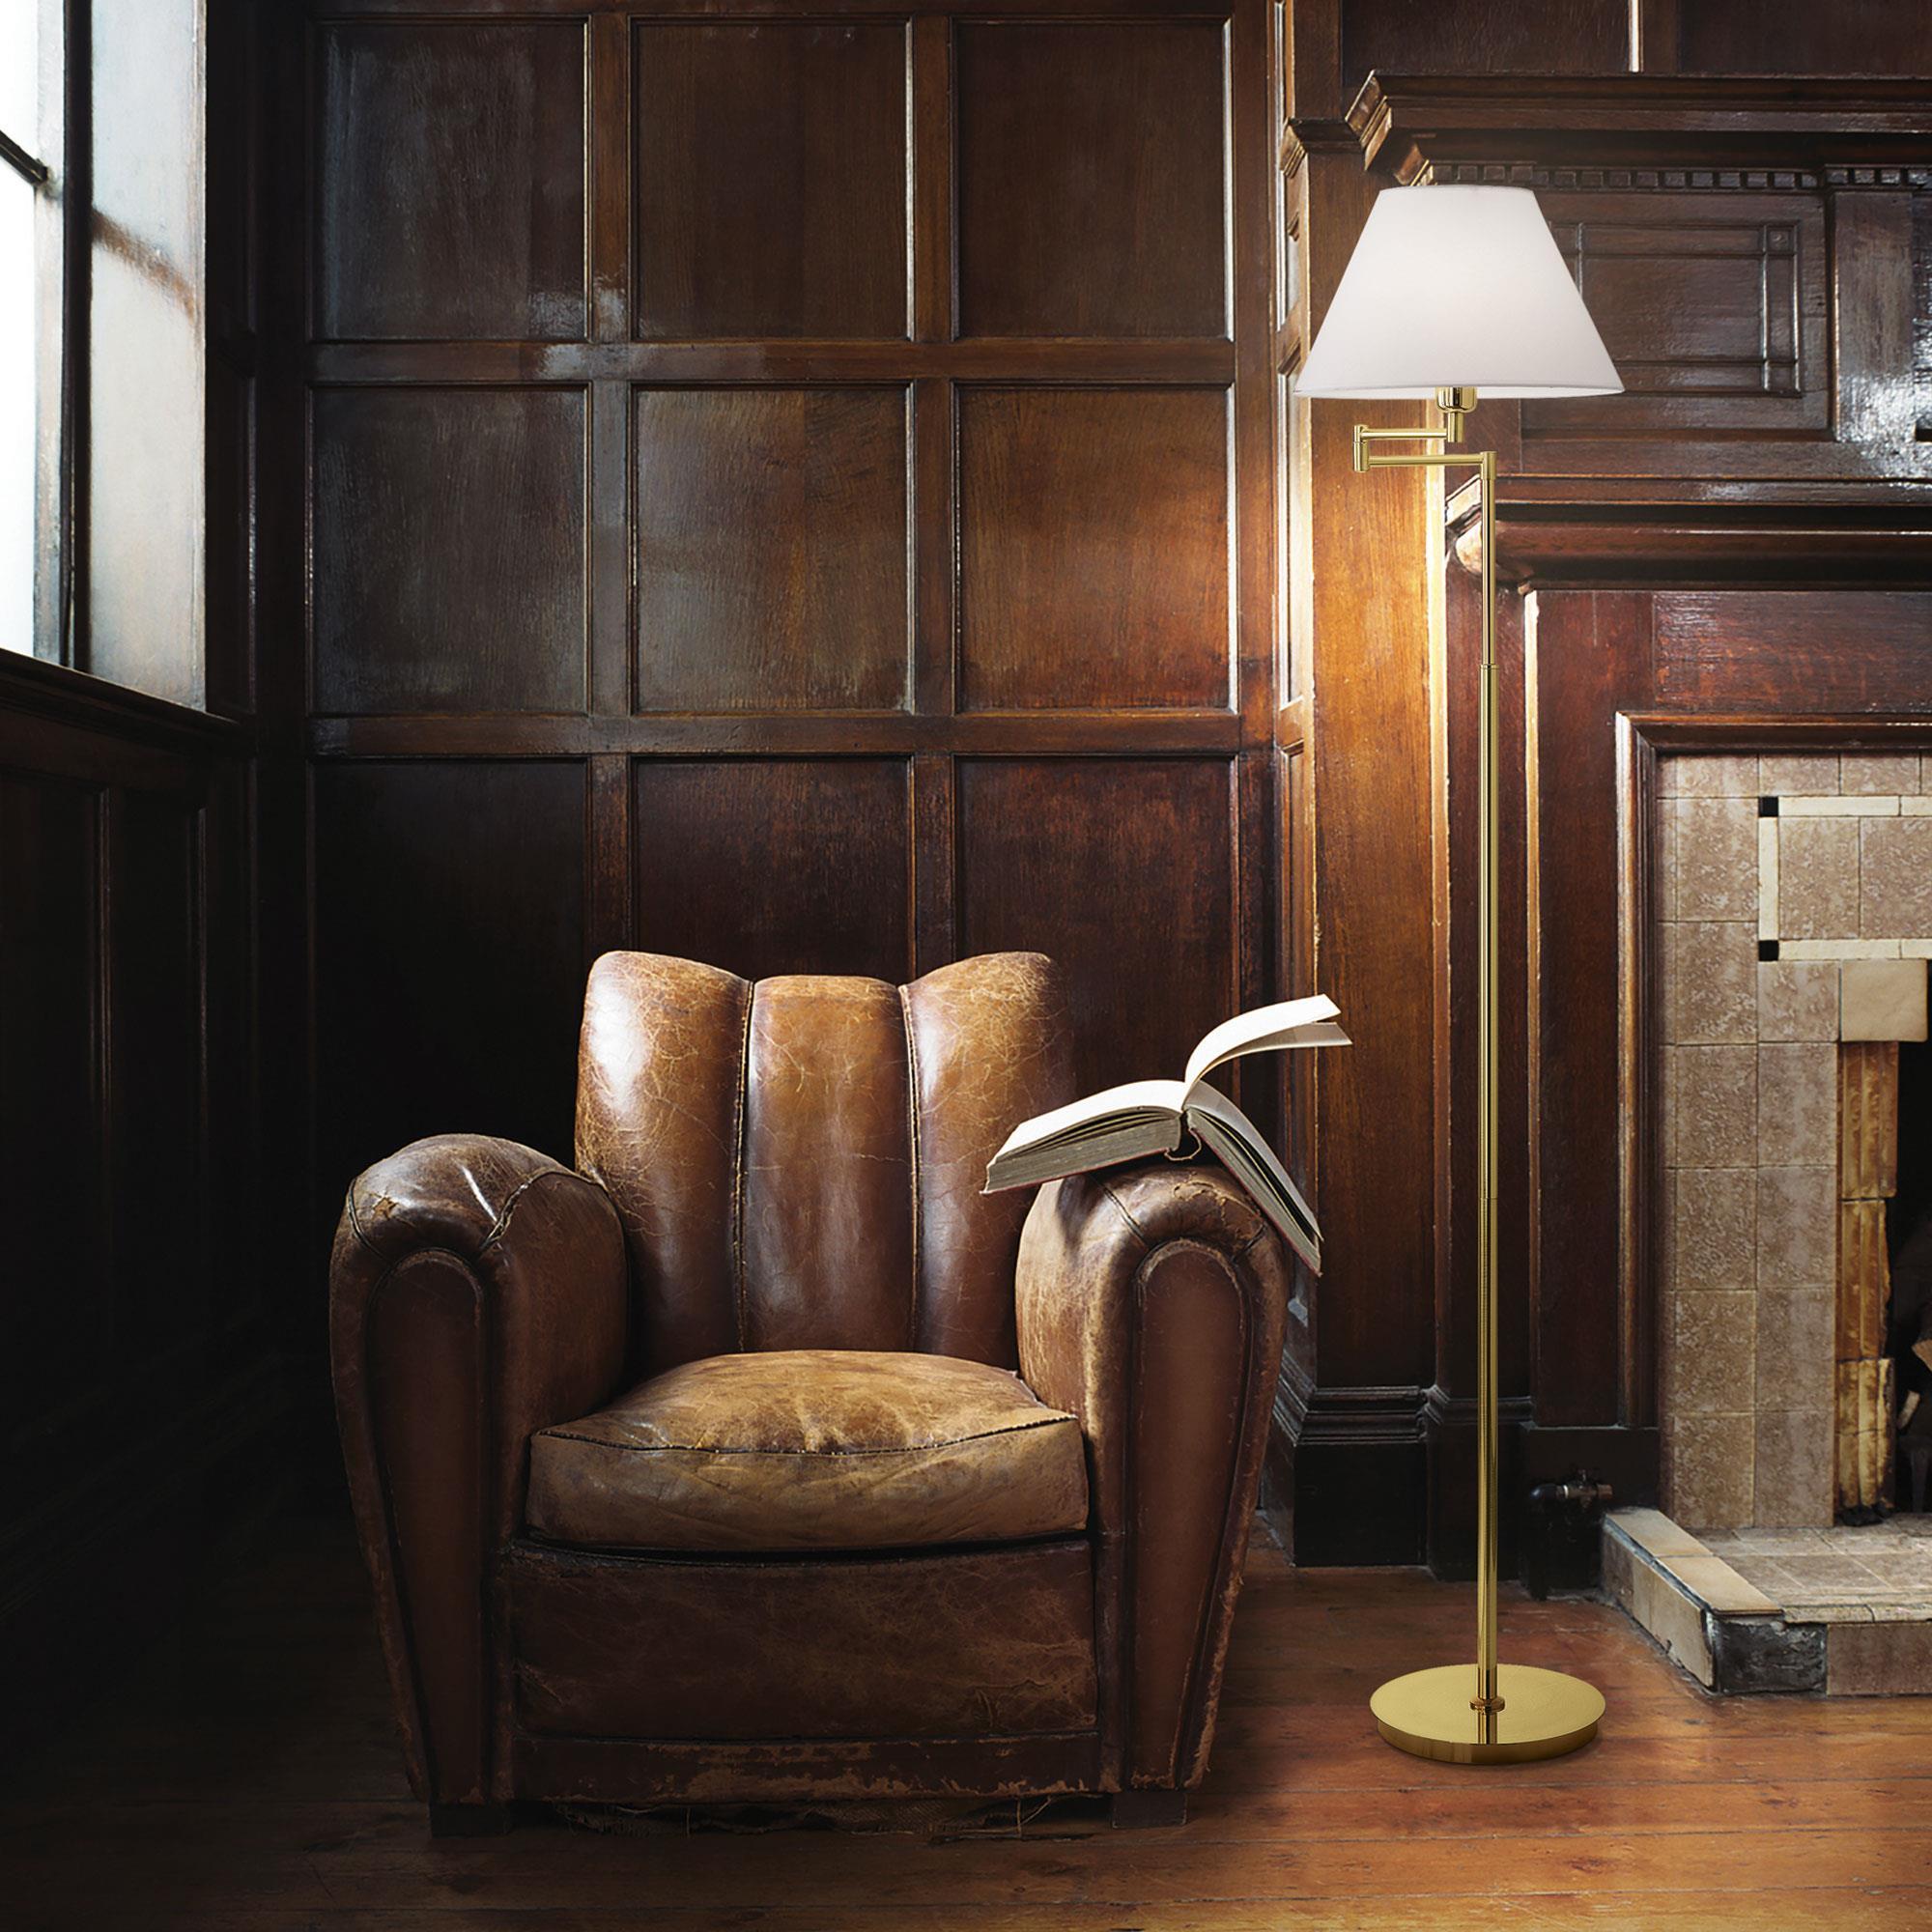 Ideal Lux 140315 BEVERLY PT1 OTTONE SATINATO állólámpa